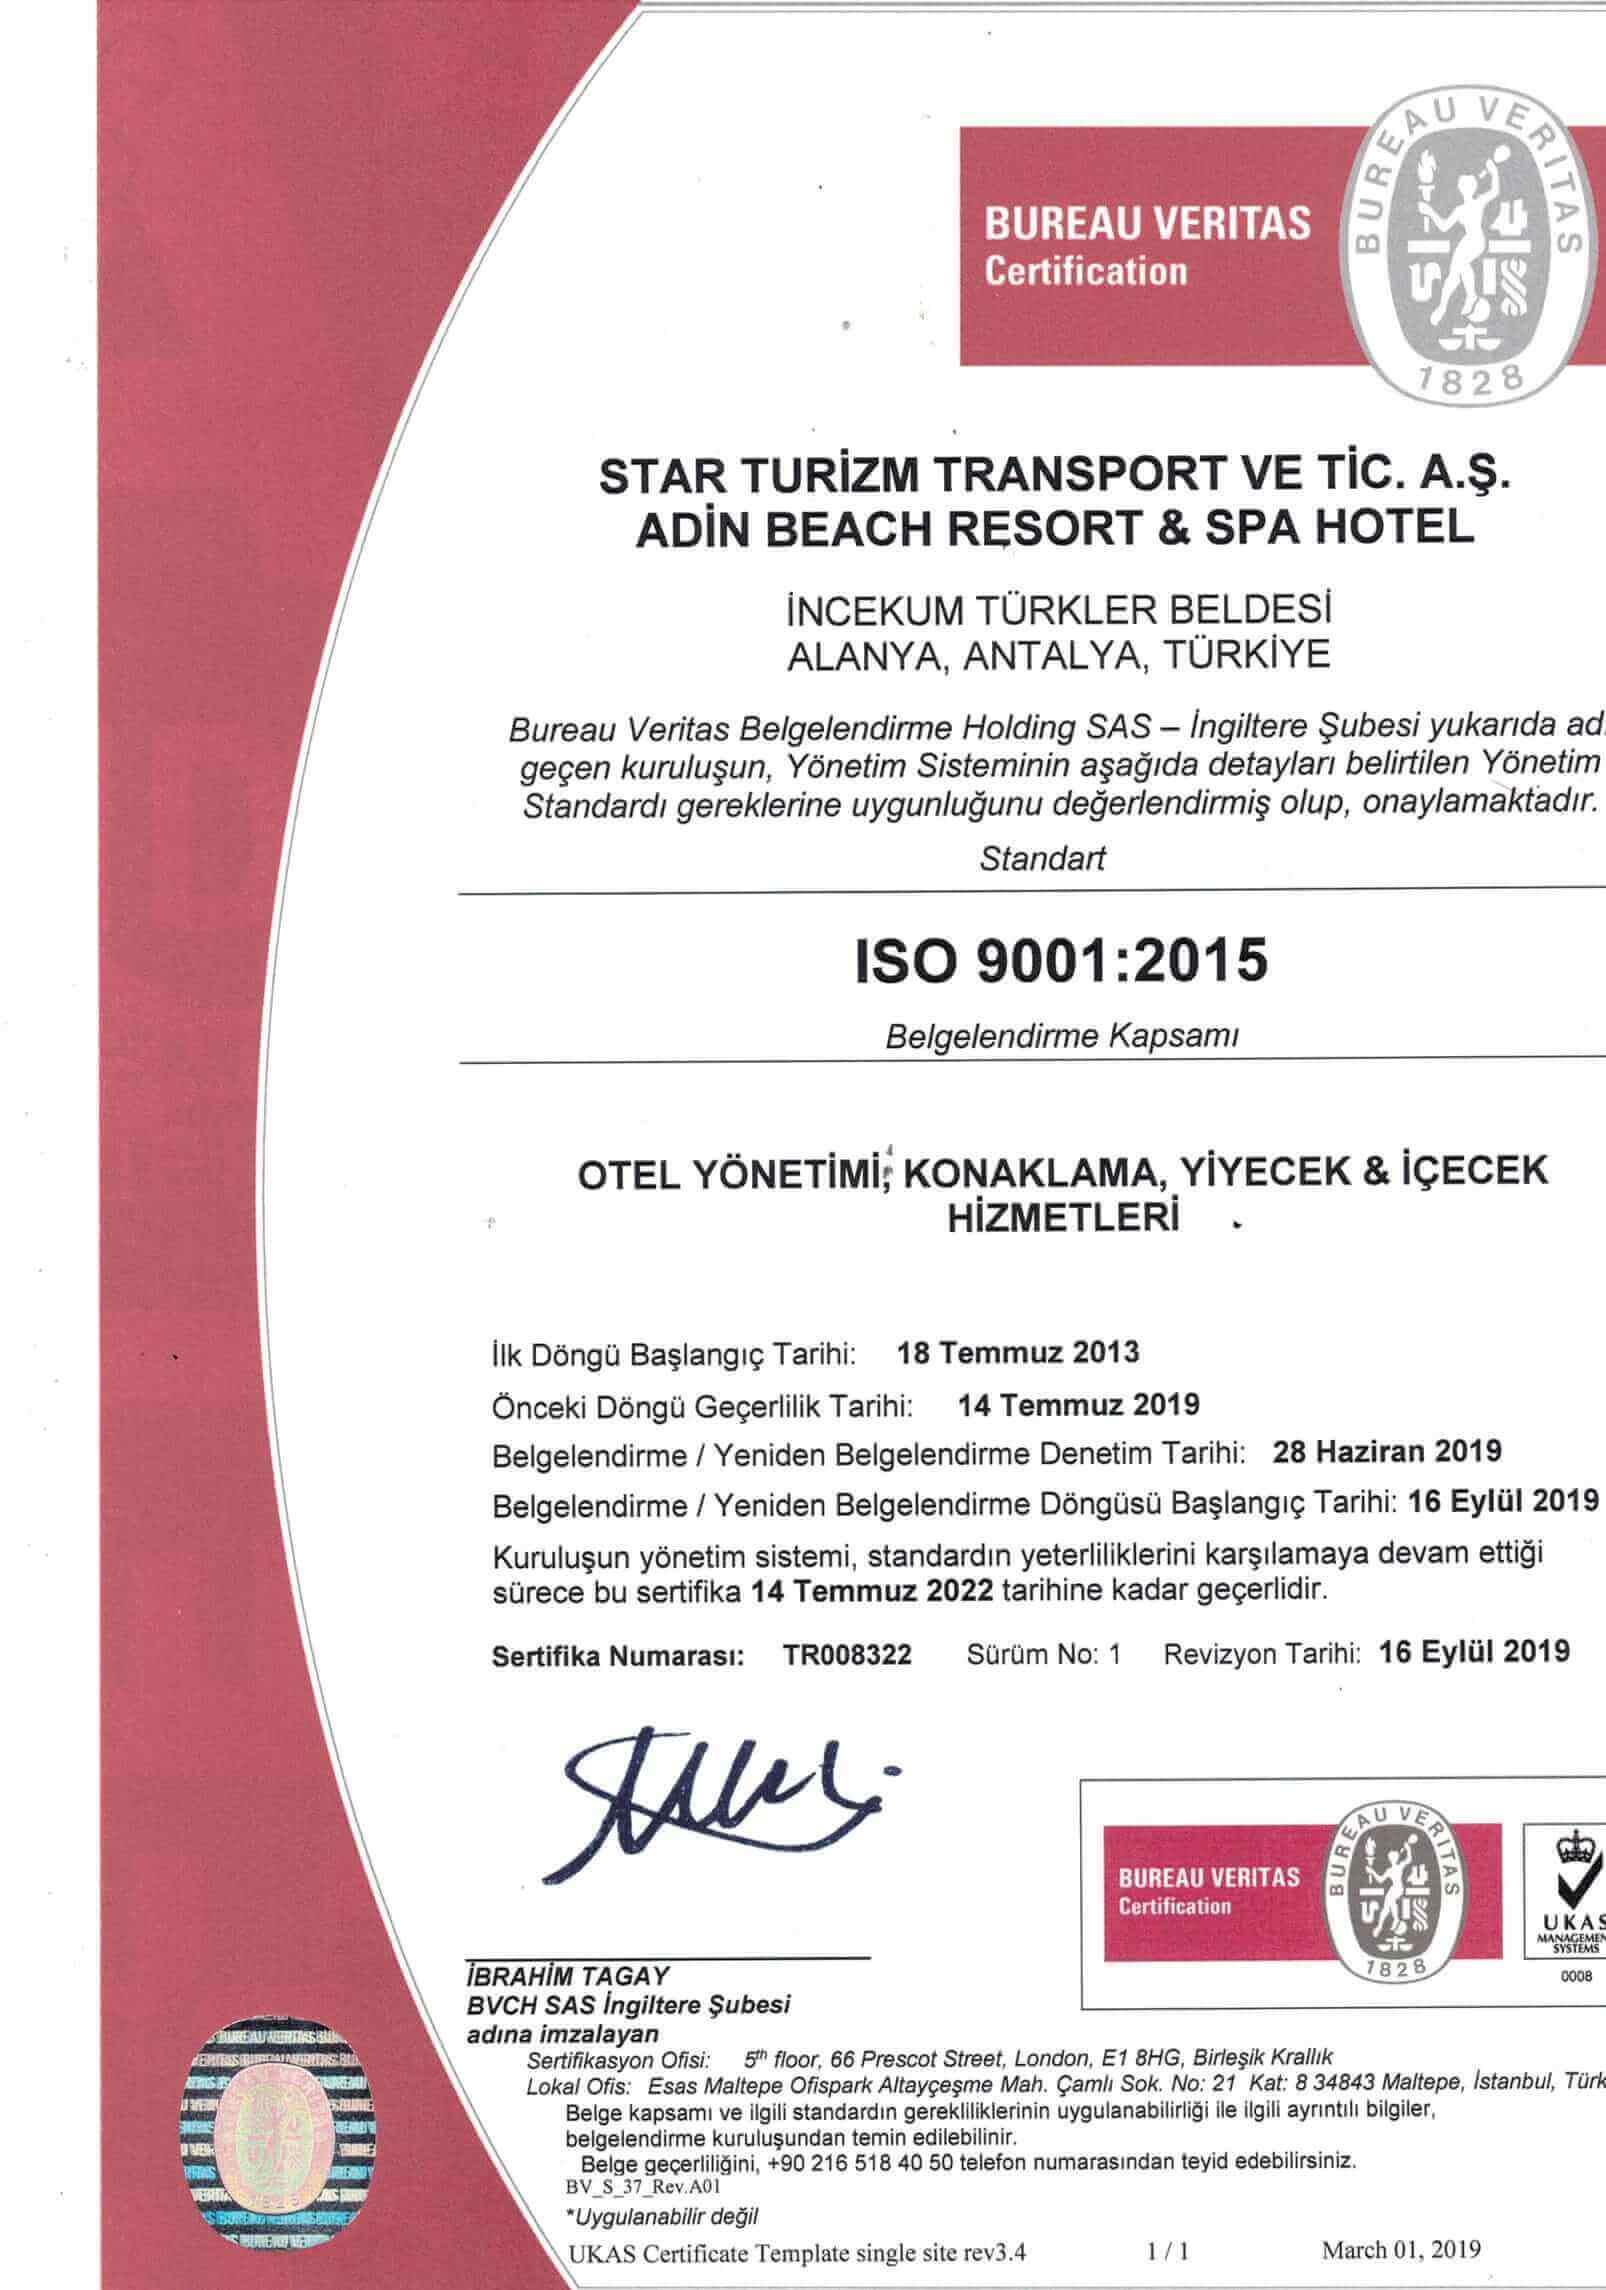 İSO 9001 belge 1. sayfa